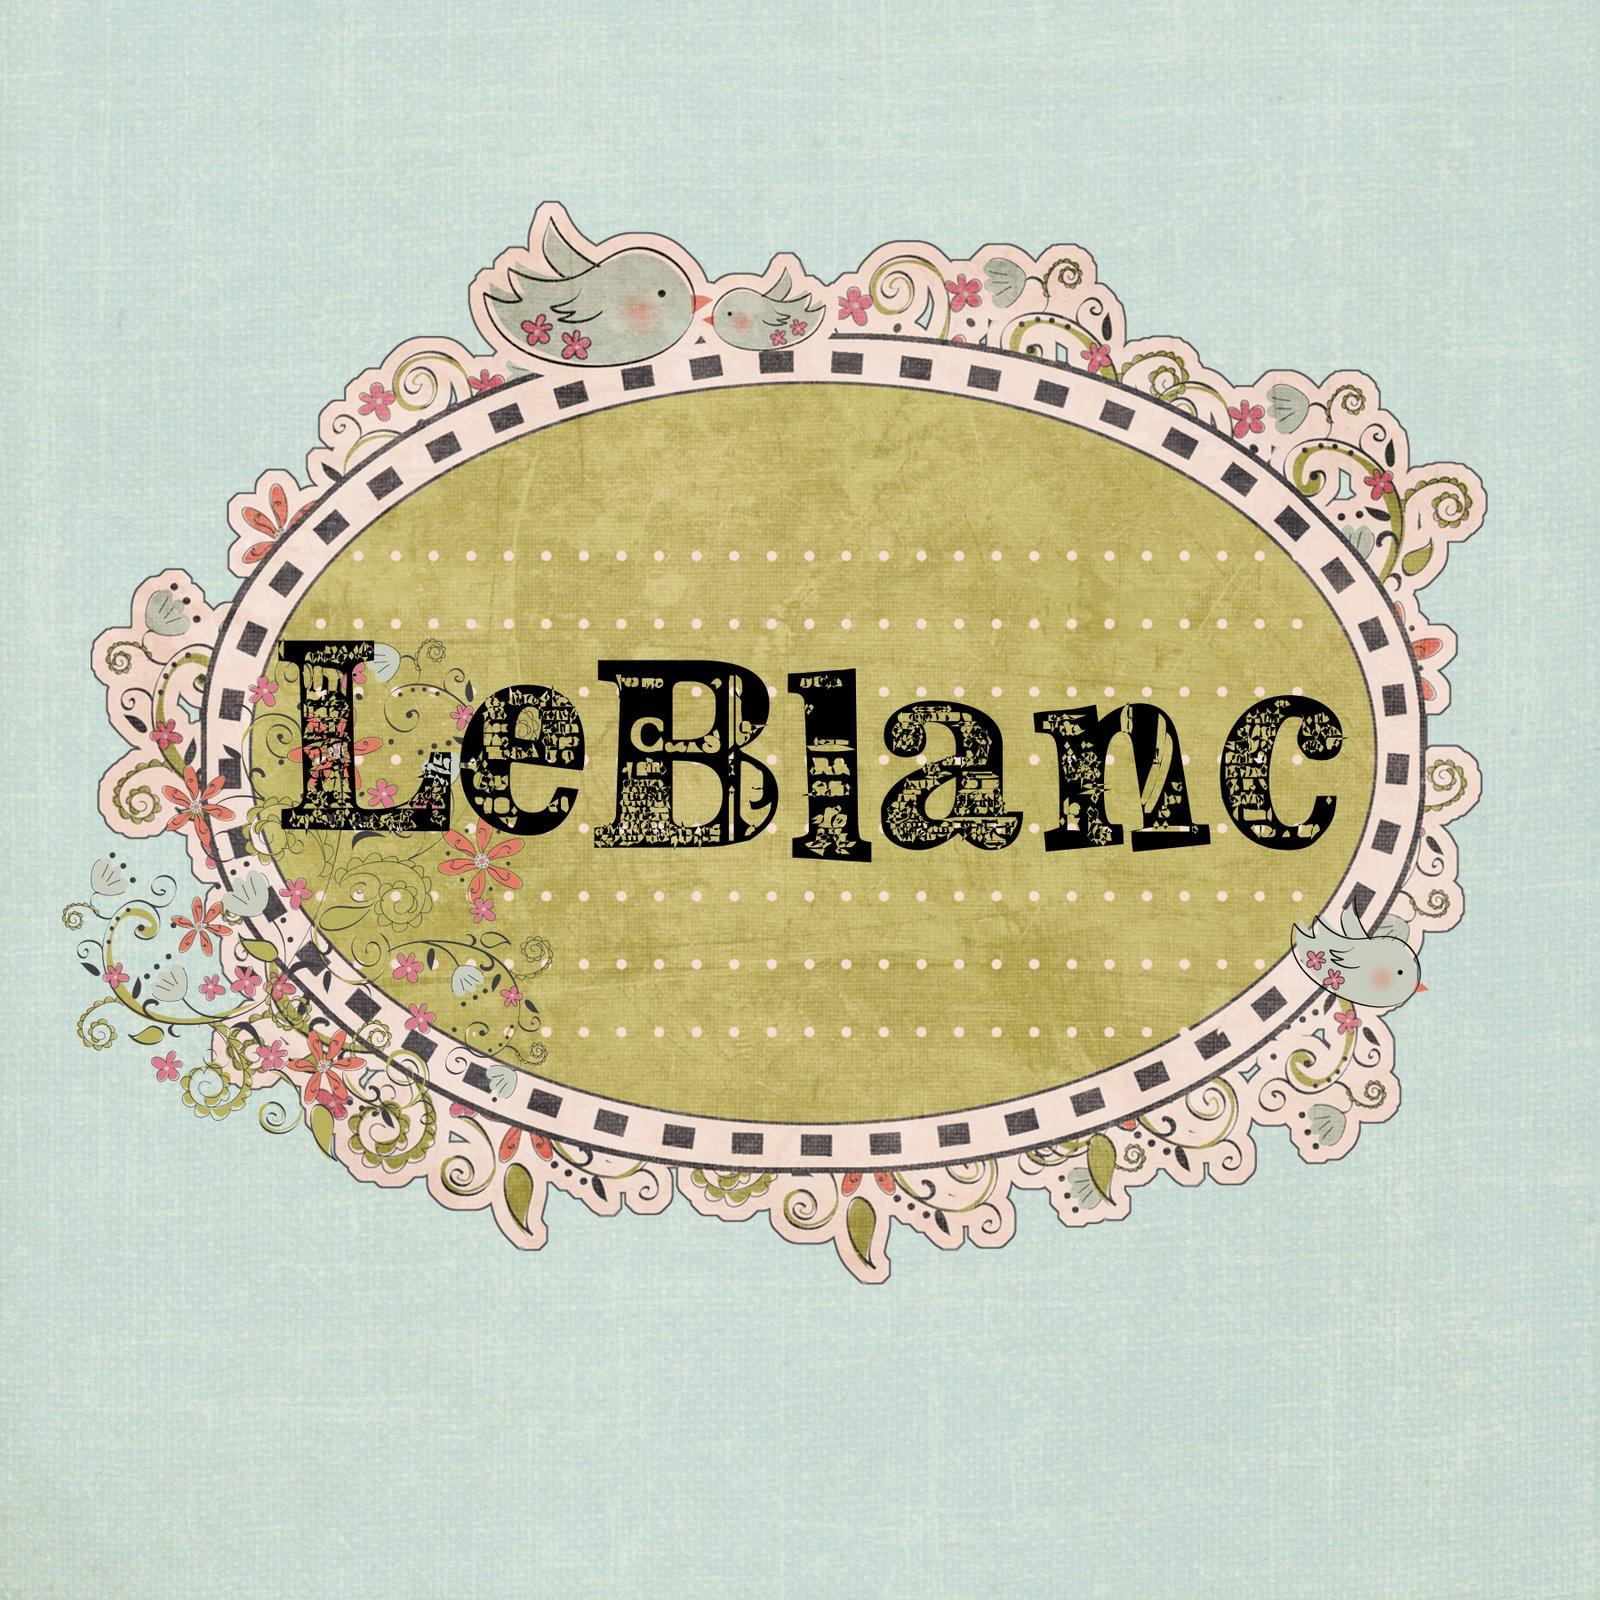 LeBlanc's